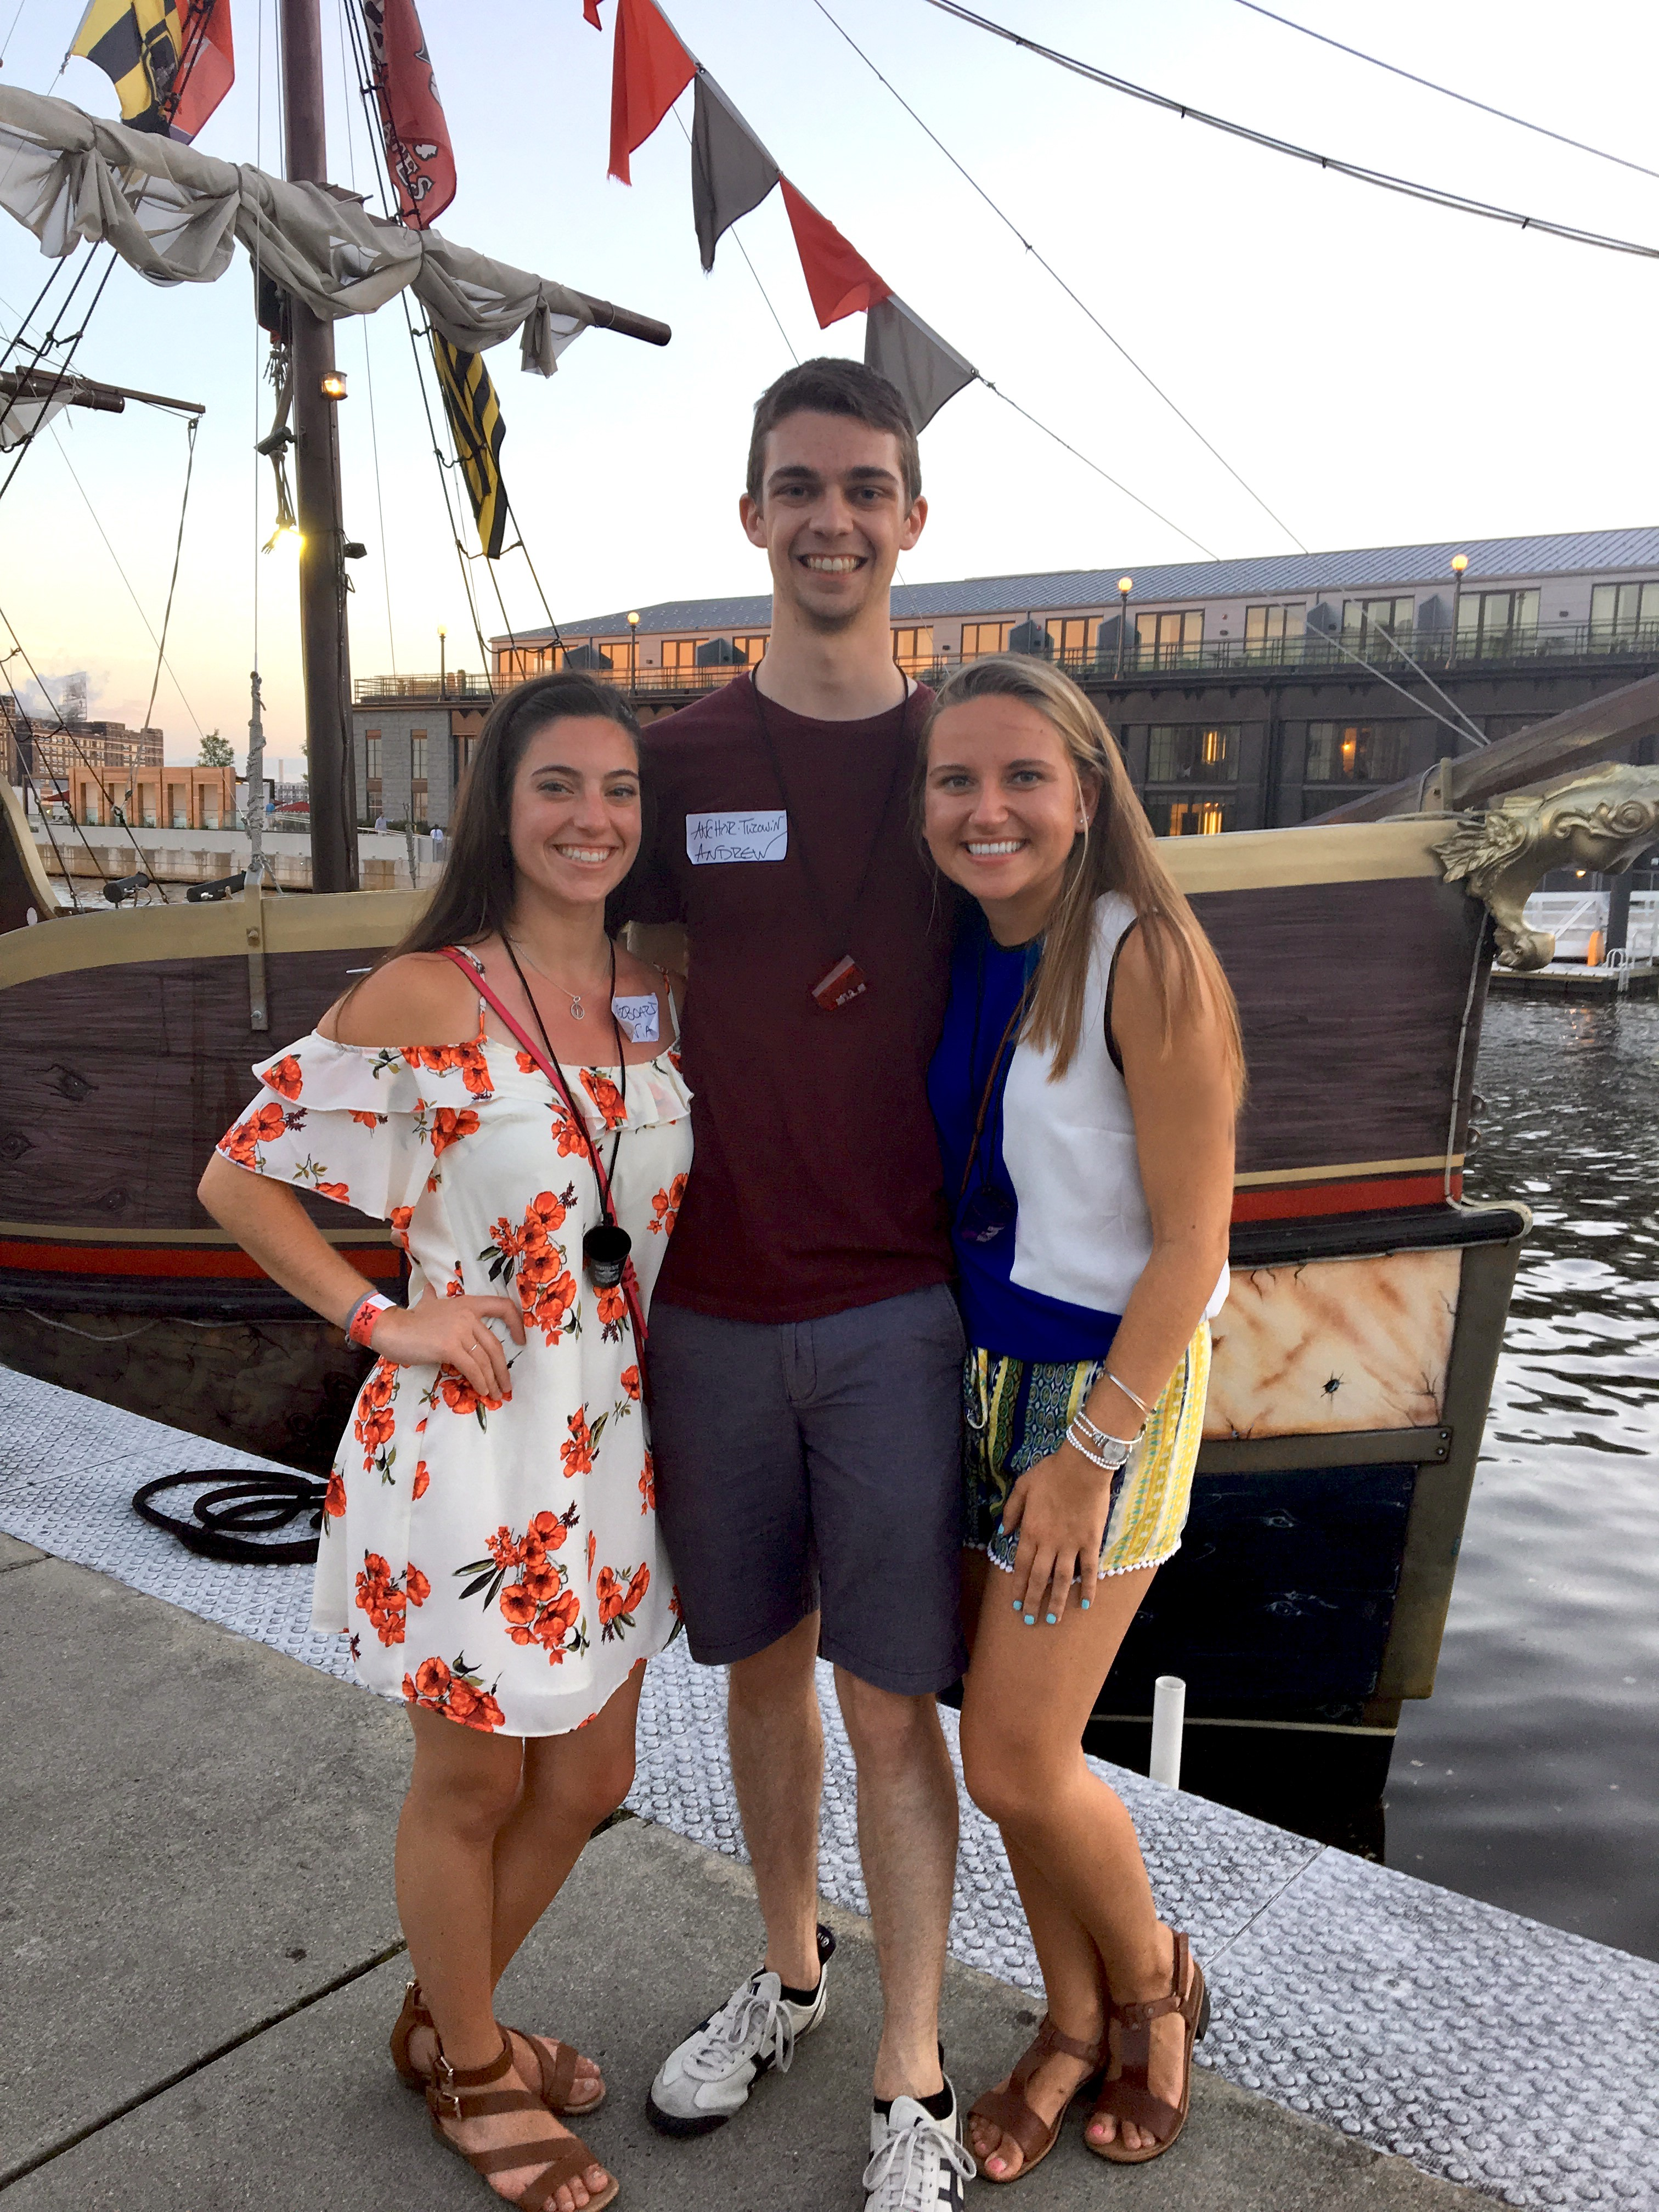 Photo of Olvia Walker, Andrew Smith, and Olga Vlashyn in Baltimore